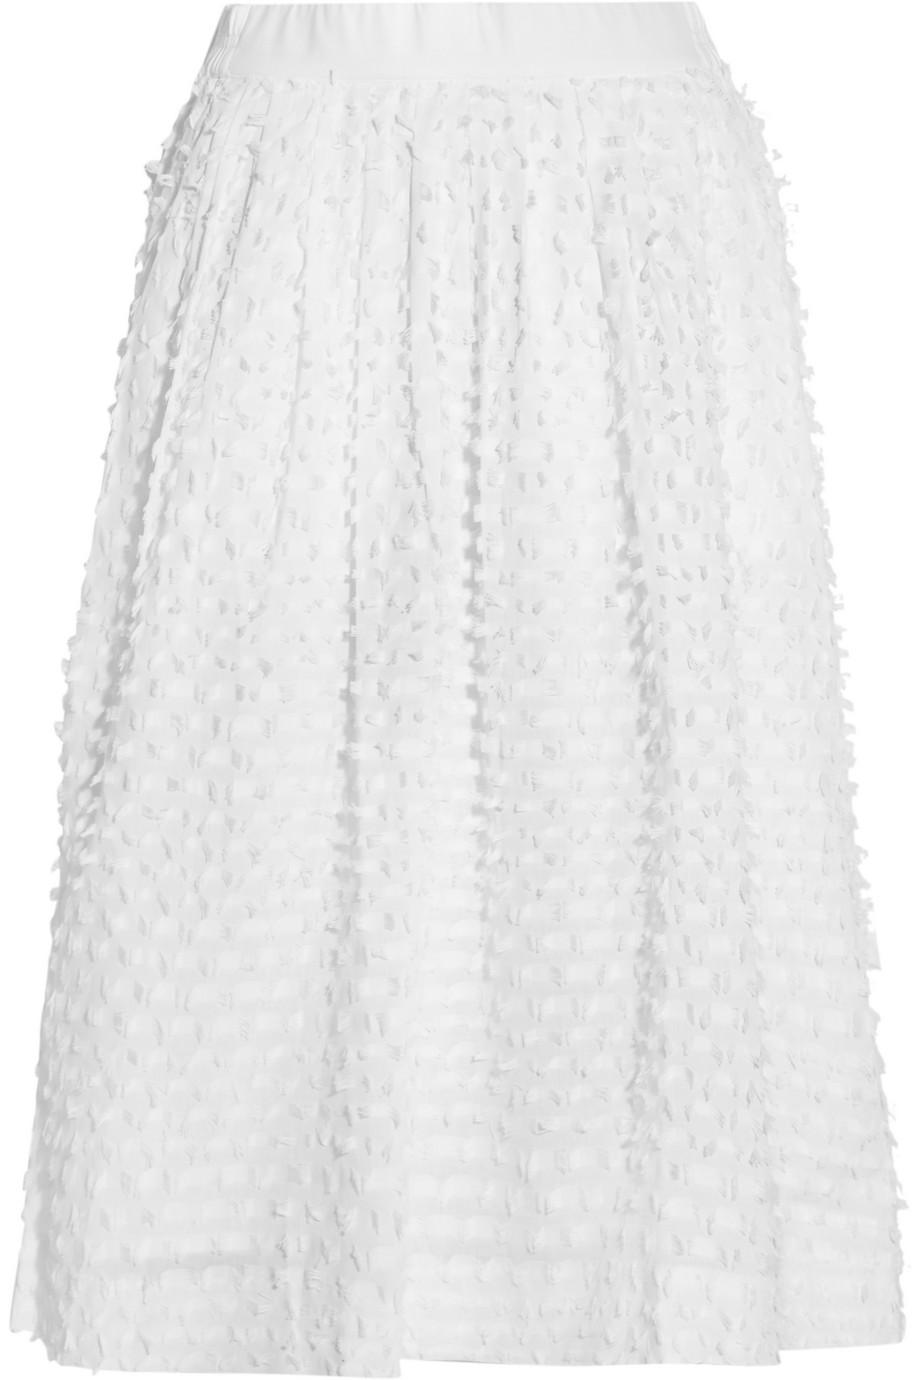 J.Crew Bradbury Fil Coupé Cotton Skirt, White, Women's, Size: 8